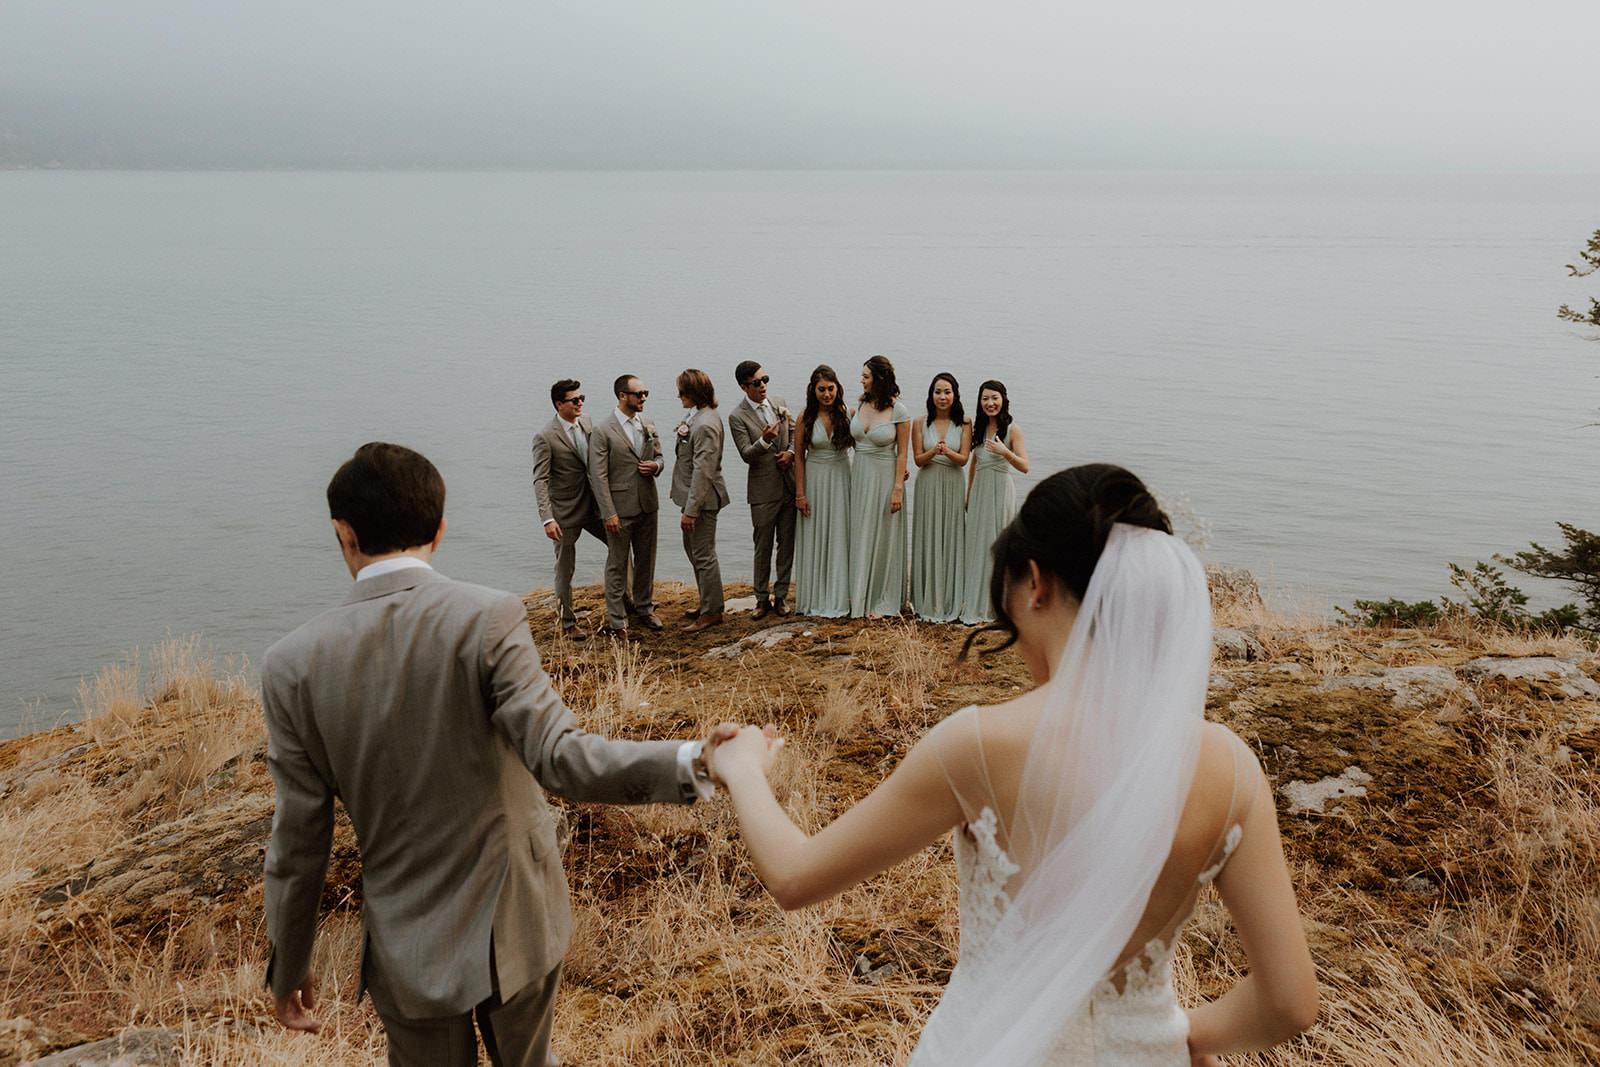 Wedding Party at Rustic Anvil Island Affair West Coast Weddings Magazine